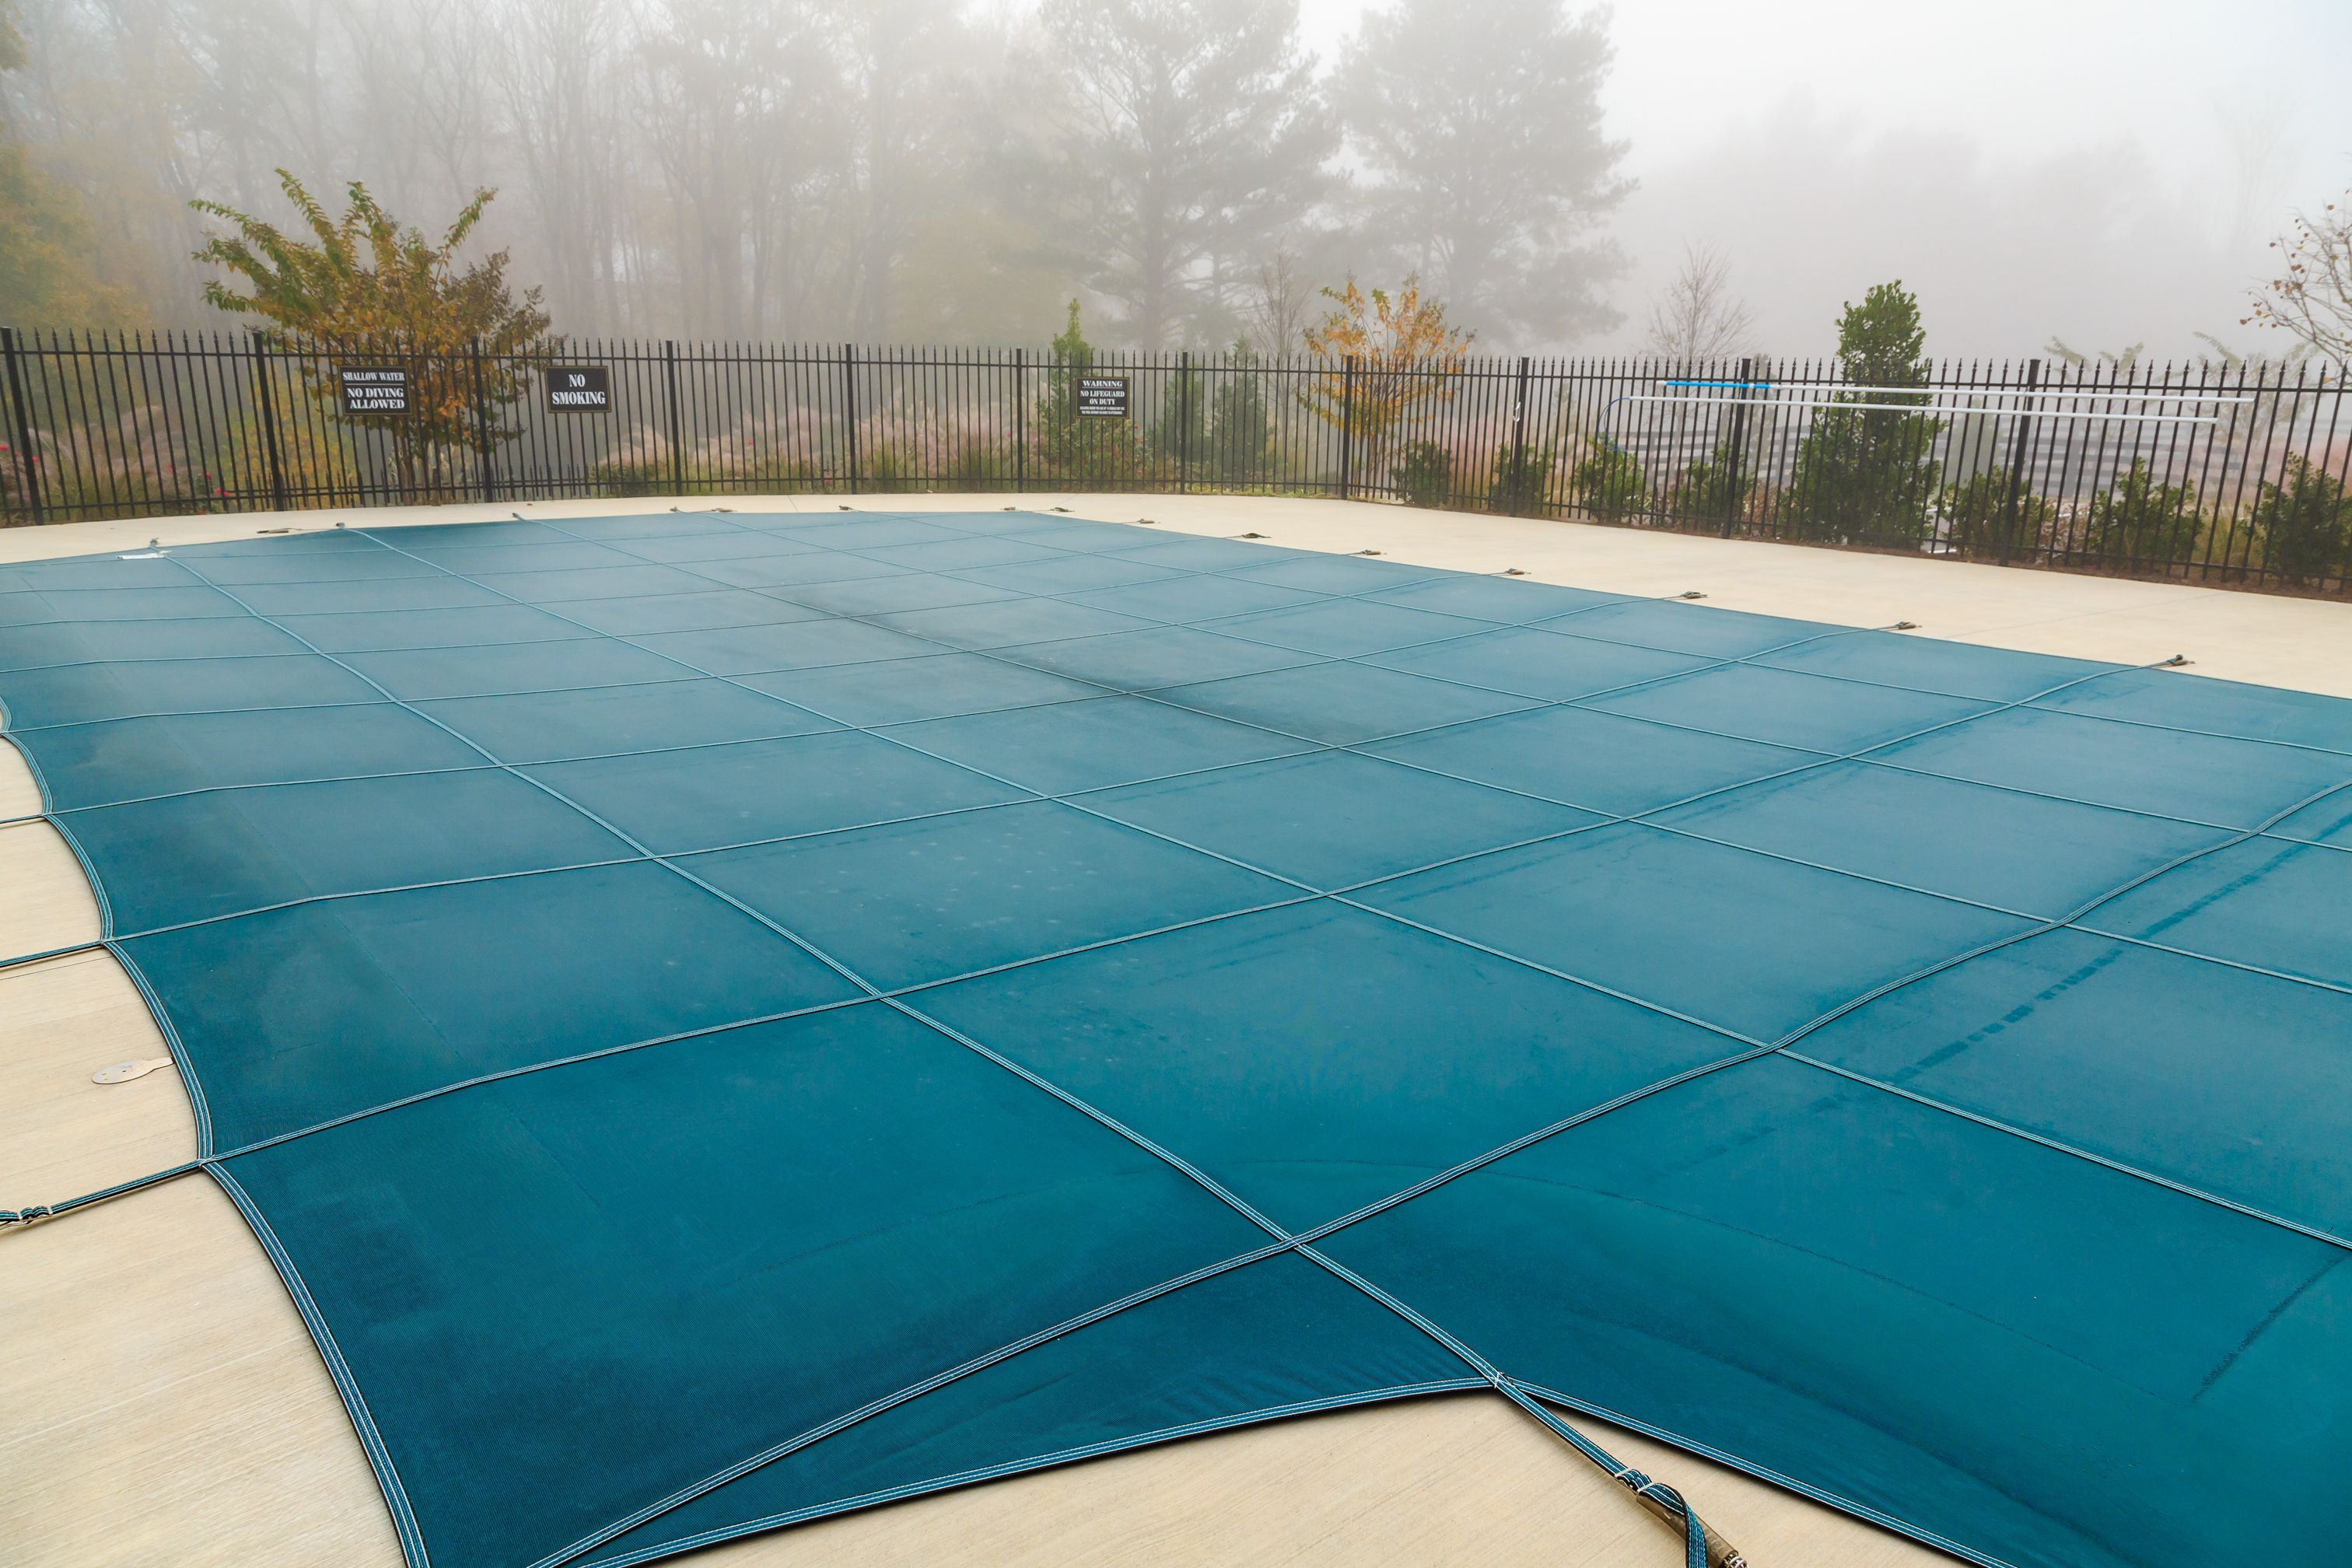 Pool Maintenance How To Winterize A Pool